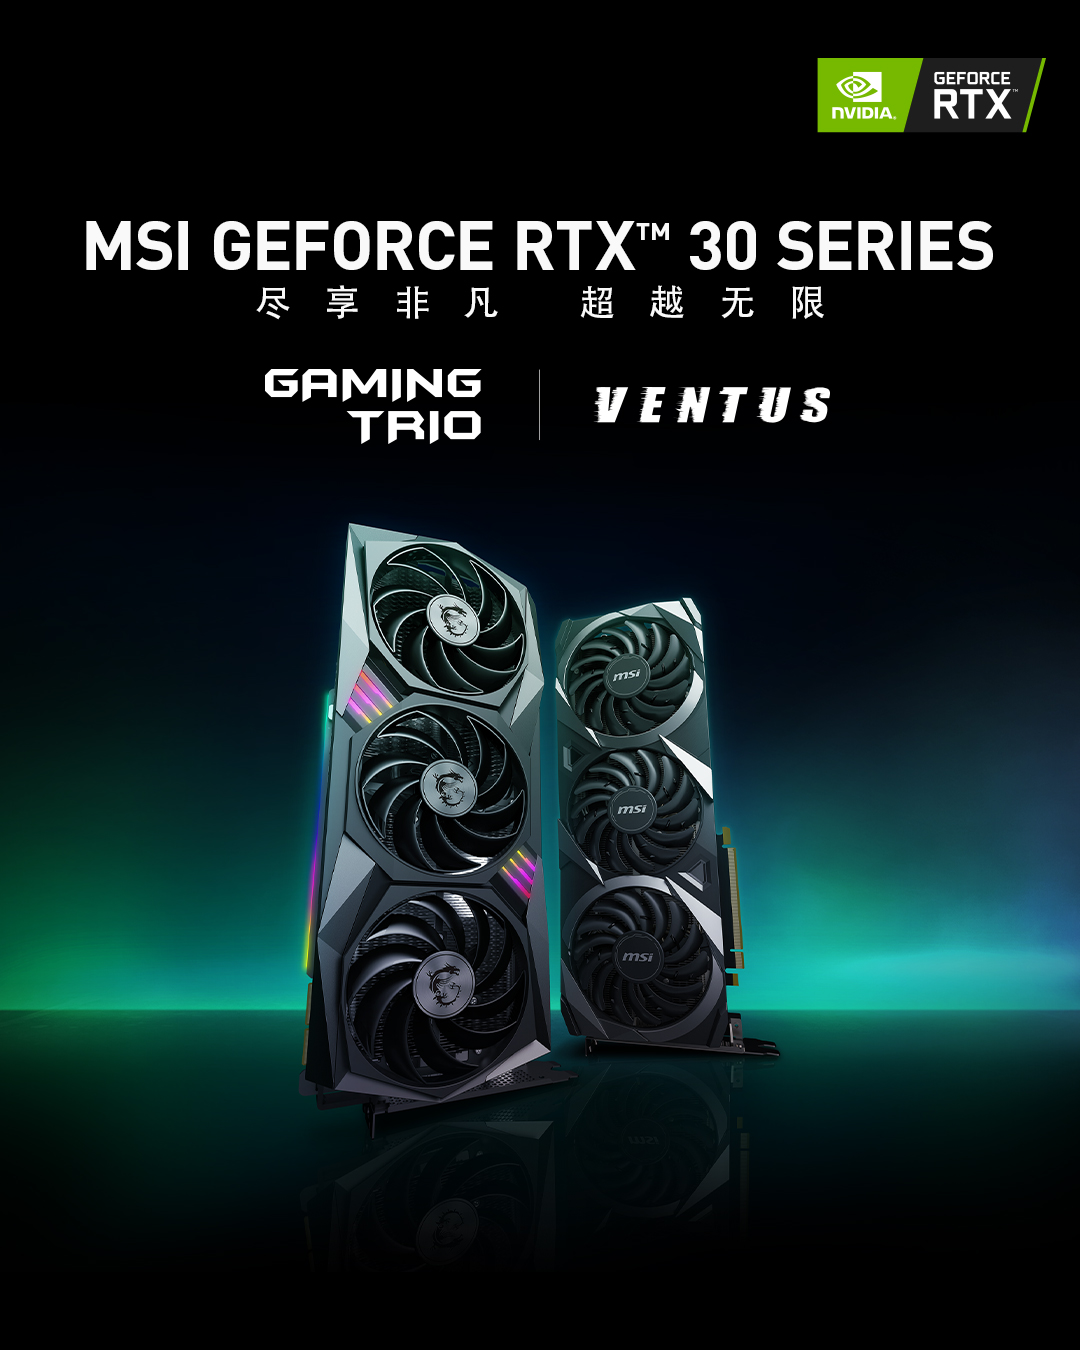 RTX 30 SERIES